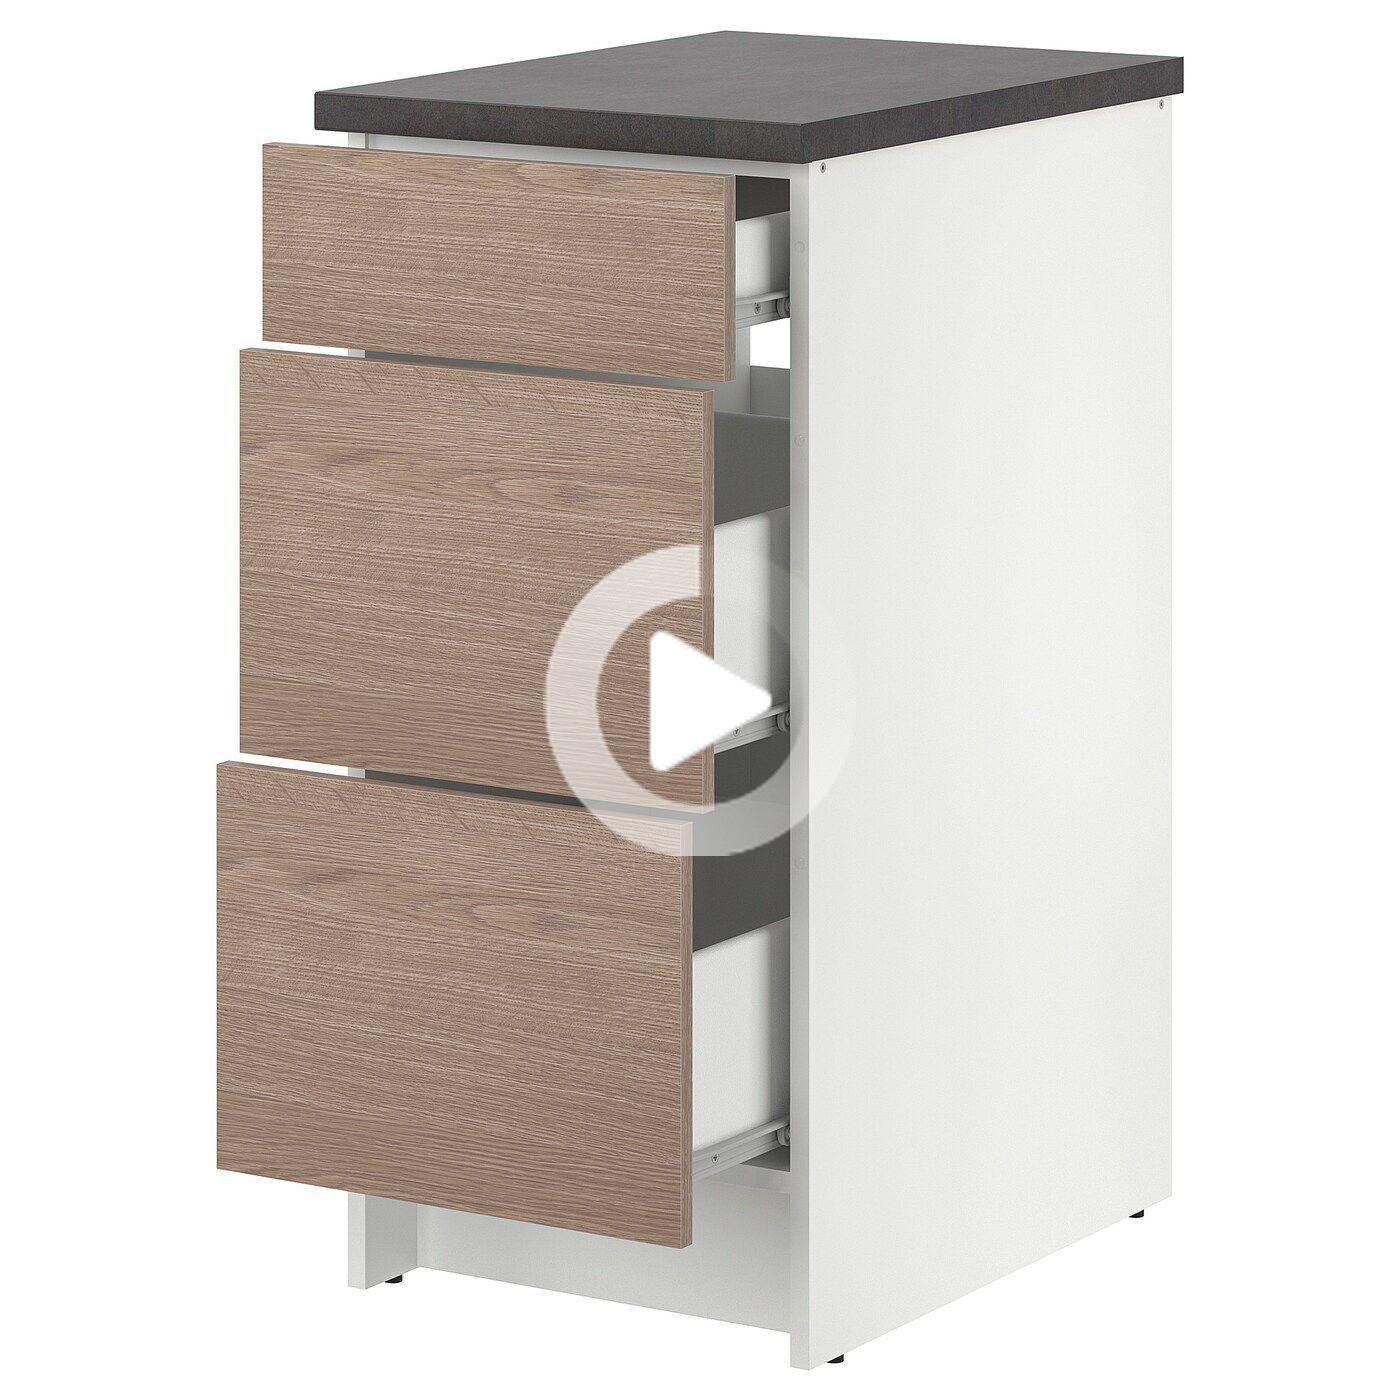 Knoxhult Element Bas Avec Tiroirs Blanc Ikea In 2020 Onder Kast Ikea Lades